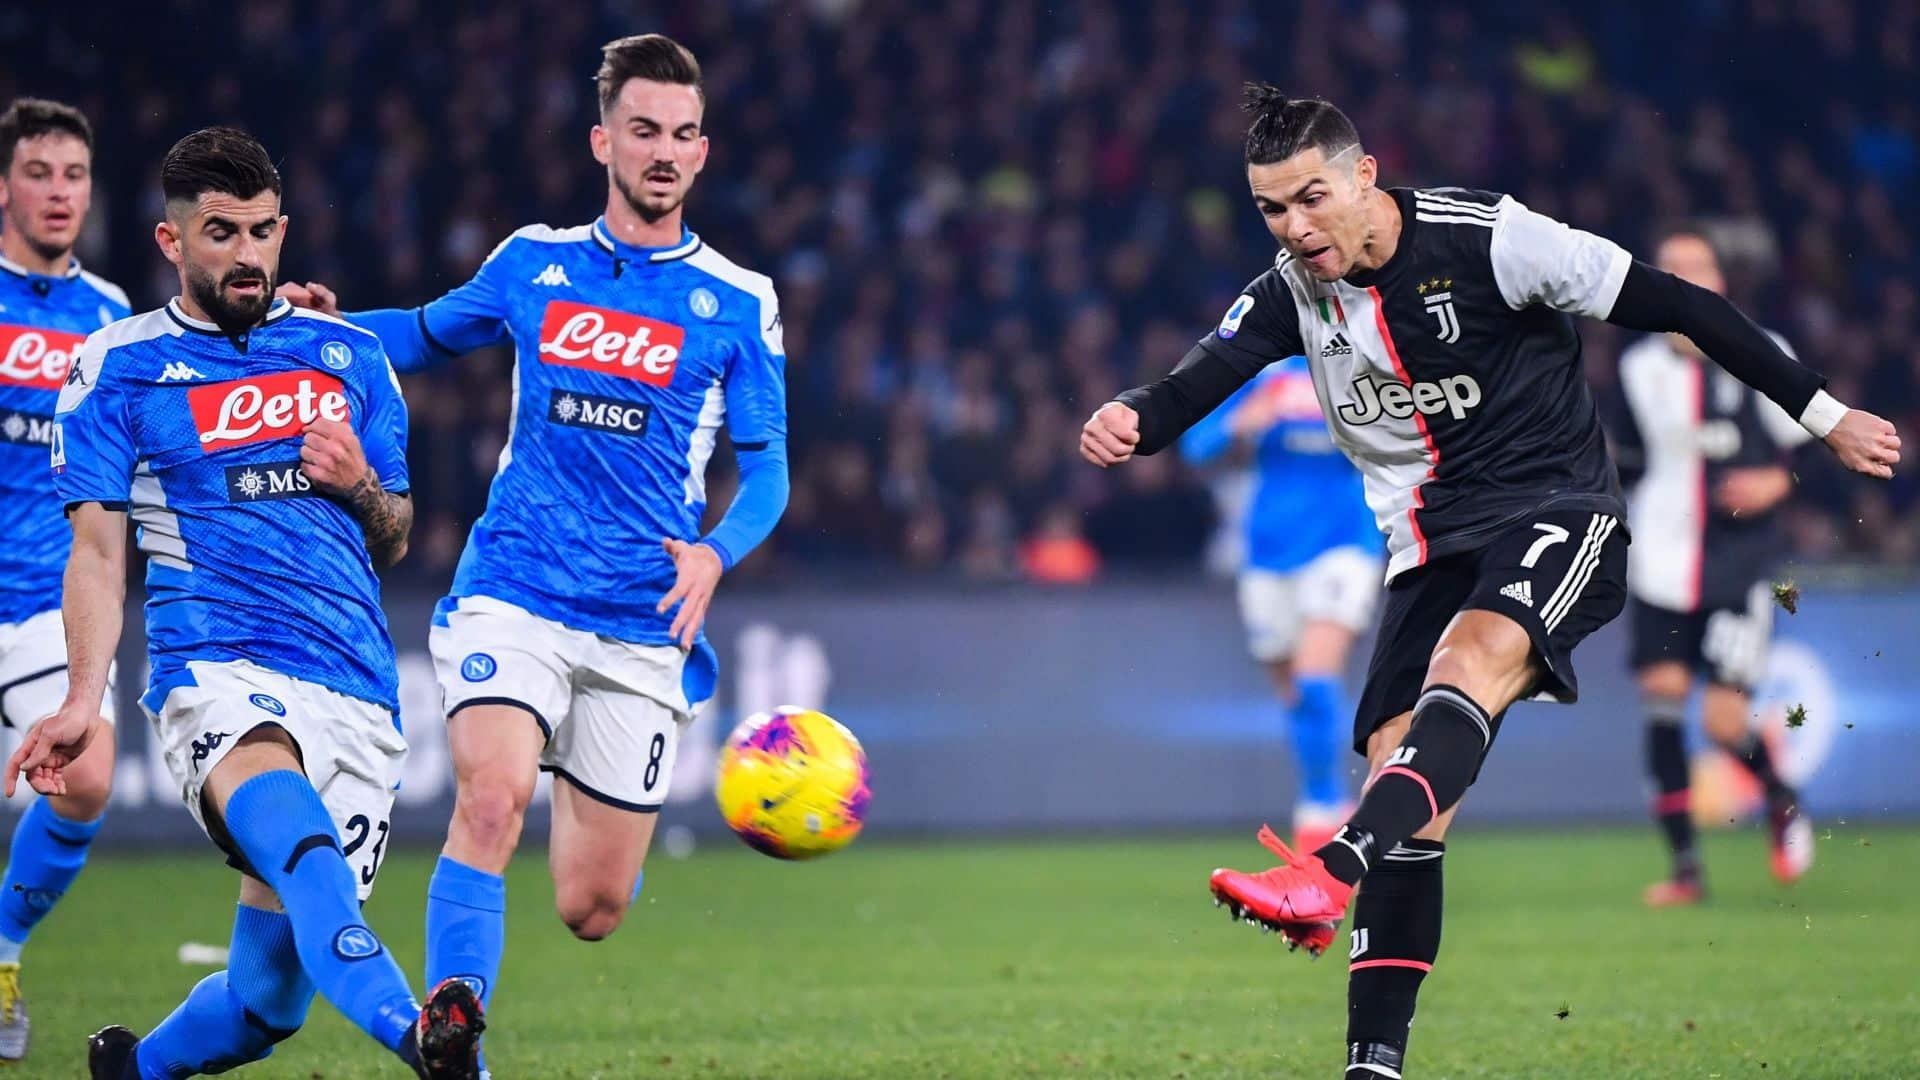 Finale Coppa Italia 2020: Napoli-Juventus